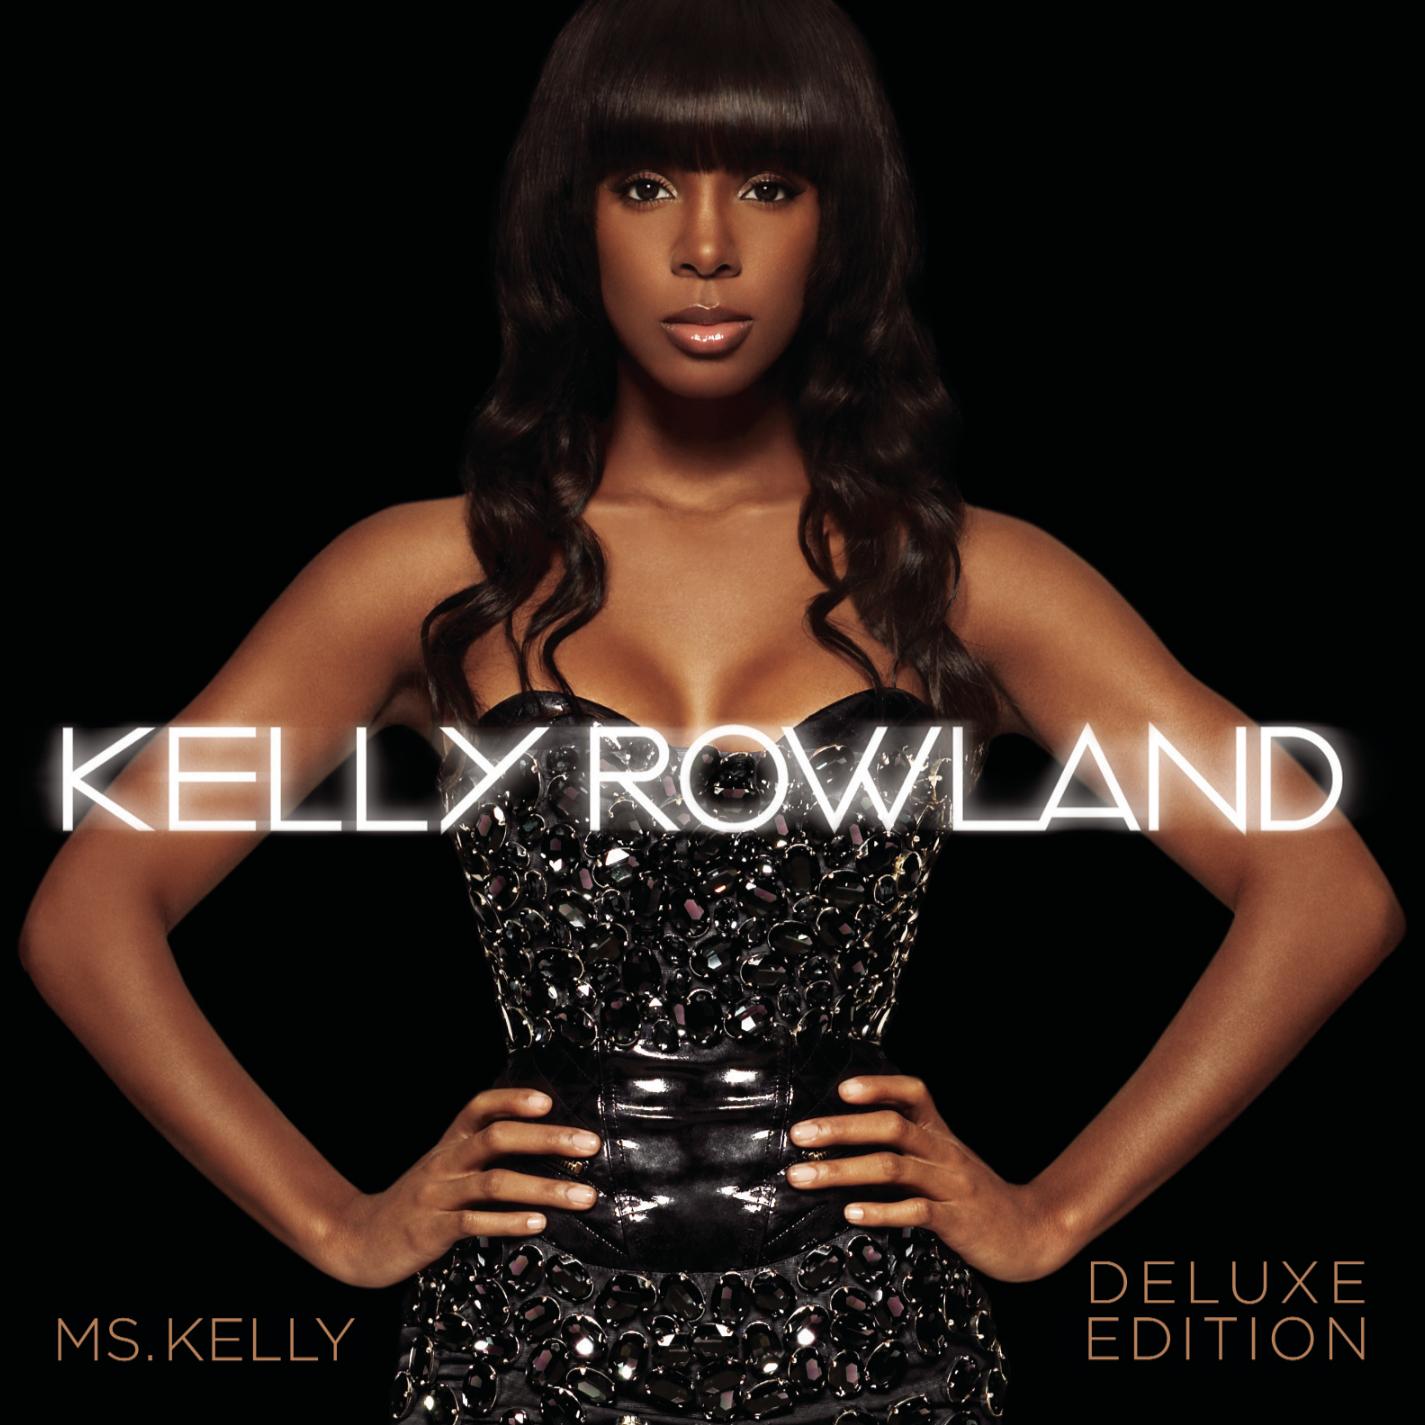 http://4.bp.blogspot.com/-3j5qHS5o-vA/TnrLruF_AaI/AAAAAAAABrE/vKbA6I79H-o/s1600/Kelly+Rowland+cover.jpg